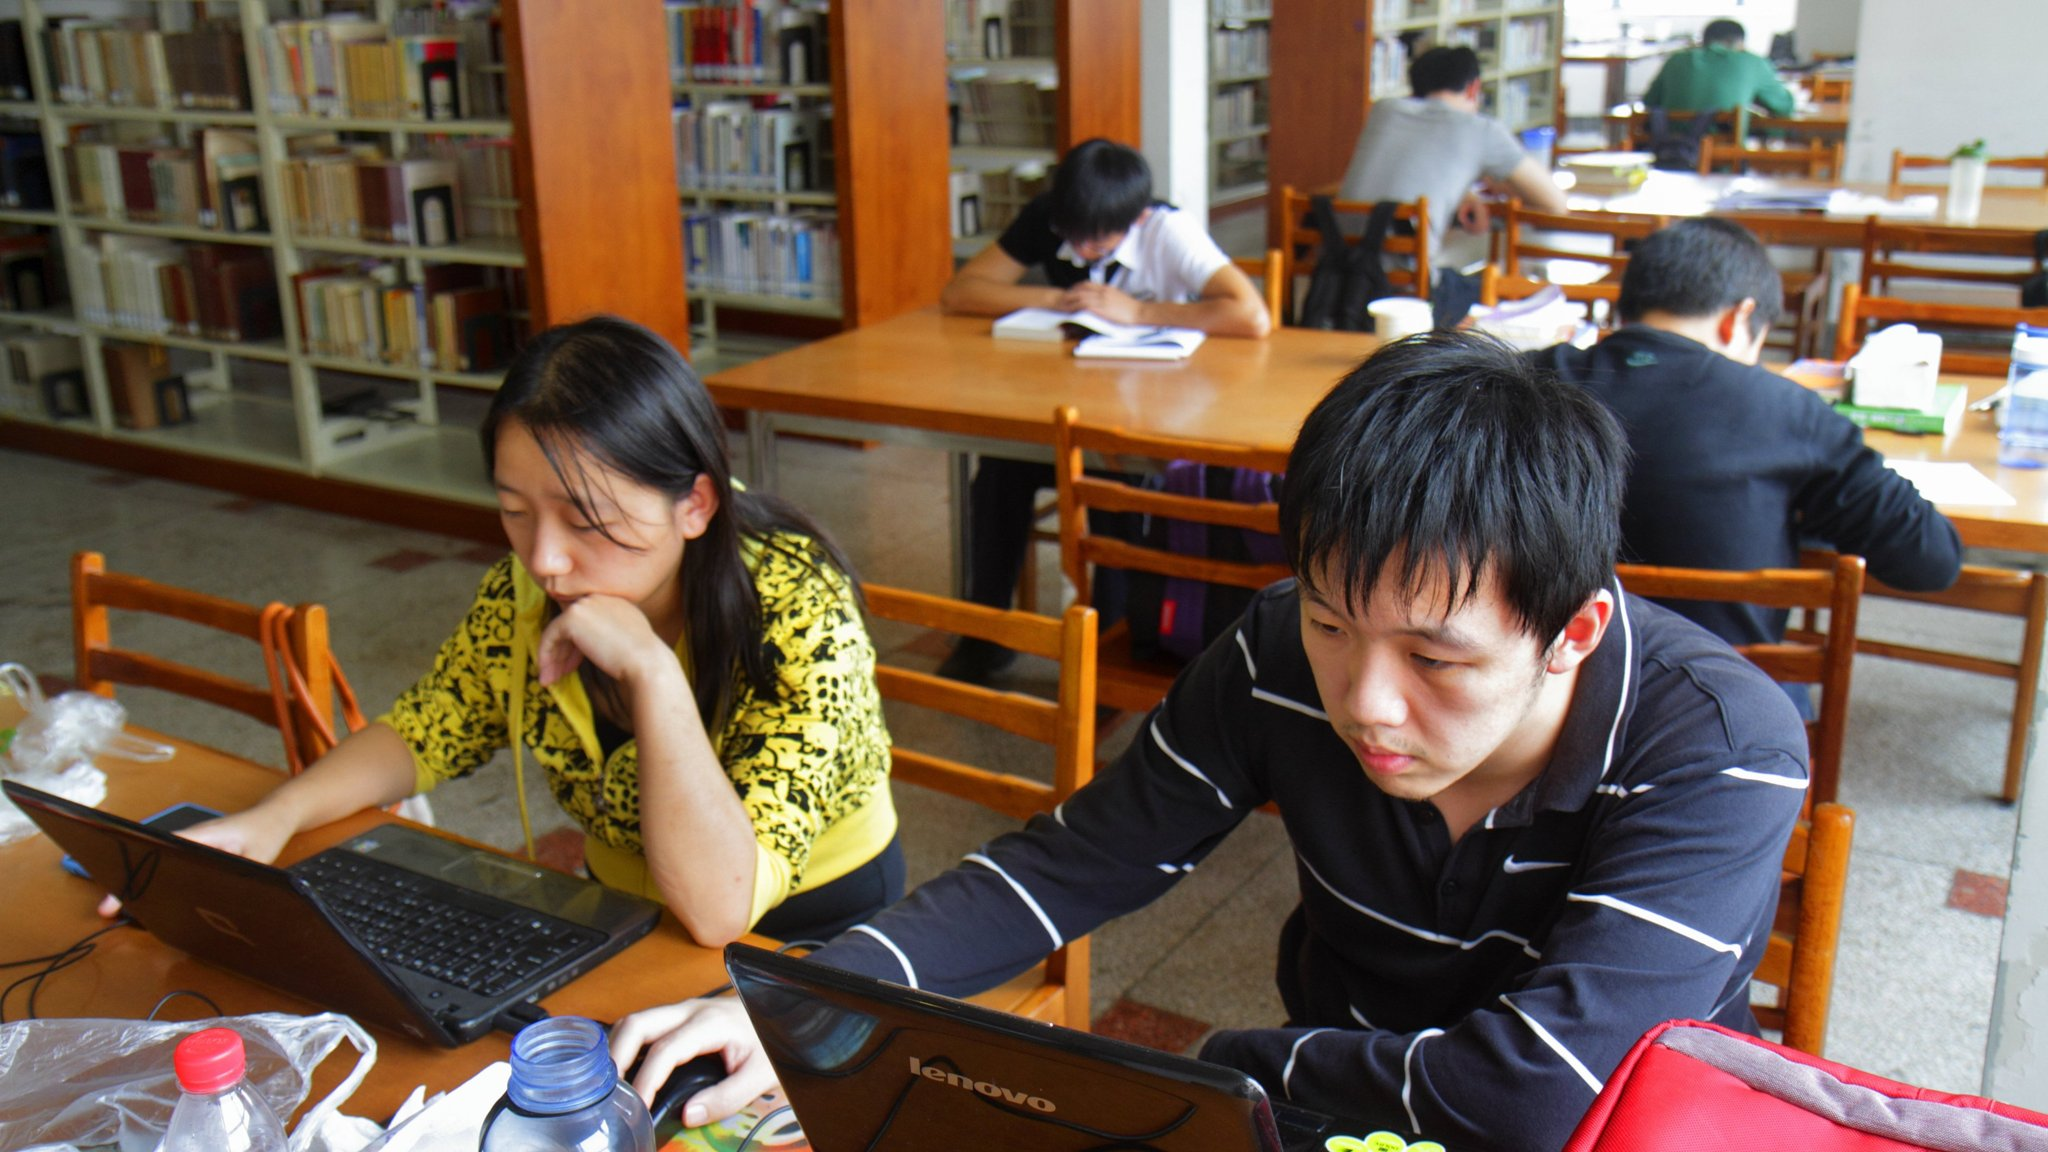 Academic publisher Springer Nature bows to Chinese censorship